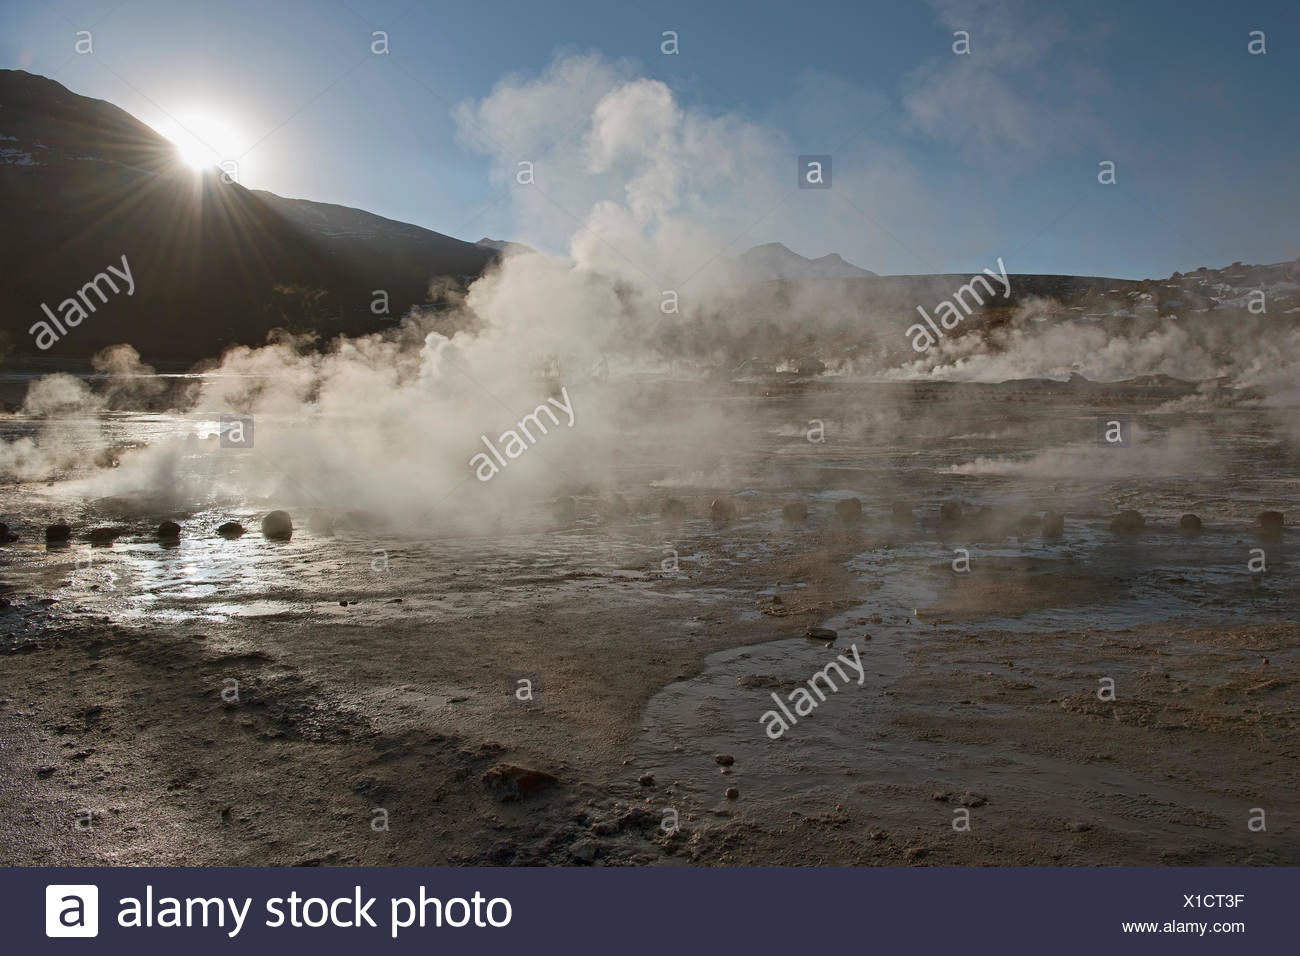 El Tatio Geysire, San Pedro de Atacama, Atacama Wüste, 4270m Höhe, Chile, Südamerika. - Stock Image